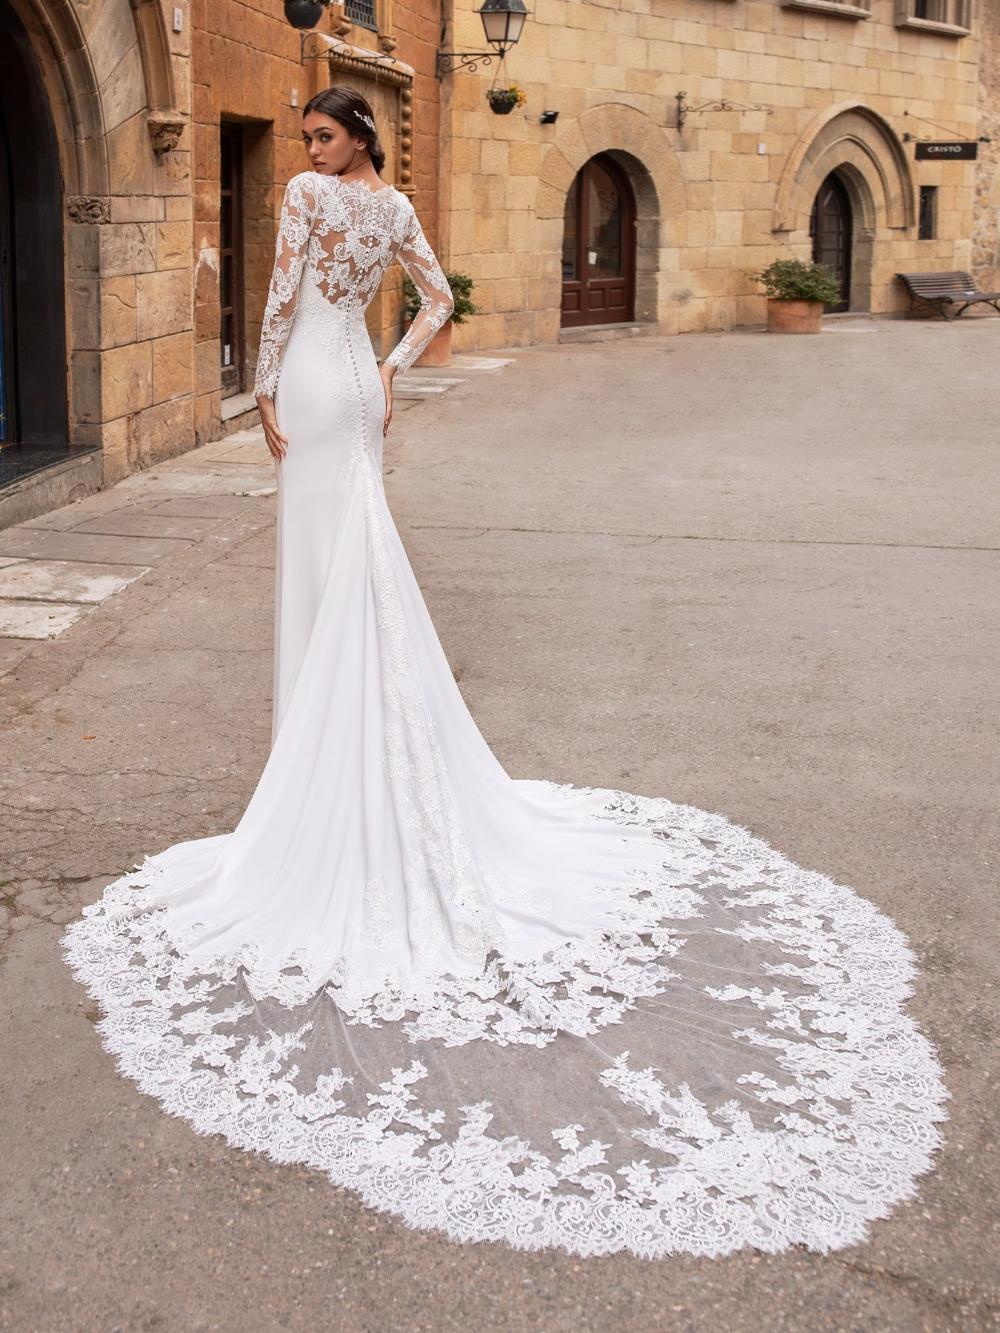 Illusion Long Sleeve V Neckline Crepe Sheath Wedding Dress Kleinfeld Bridal Long Sleeve Wedding Dress Lace Pronovias Wedding Dress Lace Wedding Dress With Sleeves [ 1333 x 1000 Pixel ]